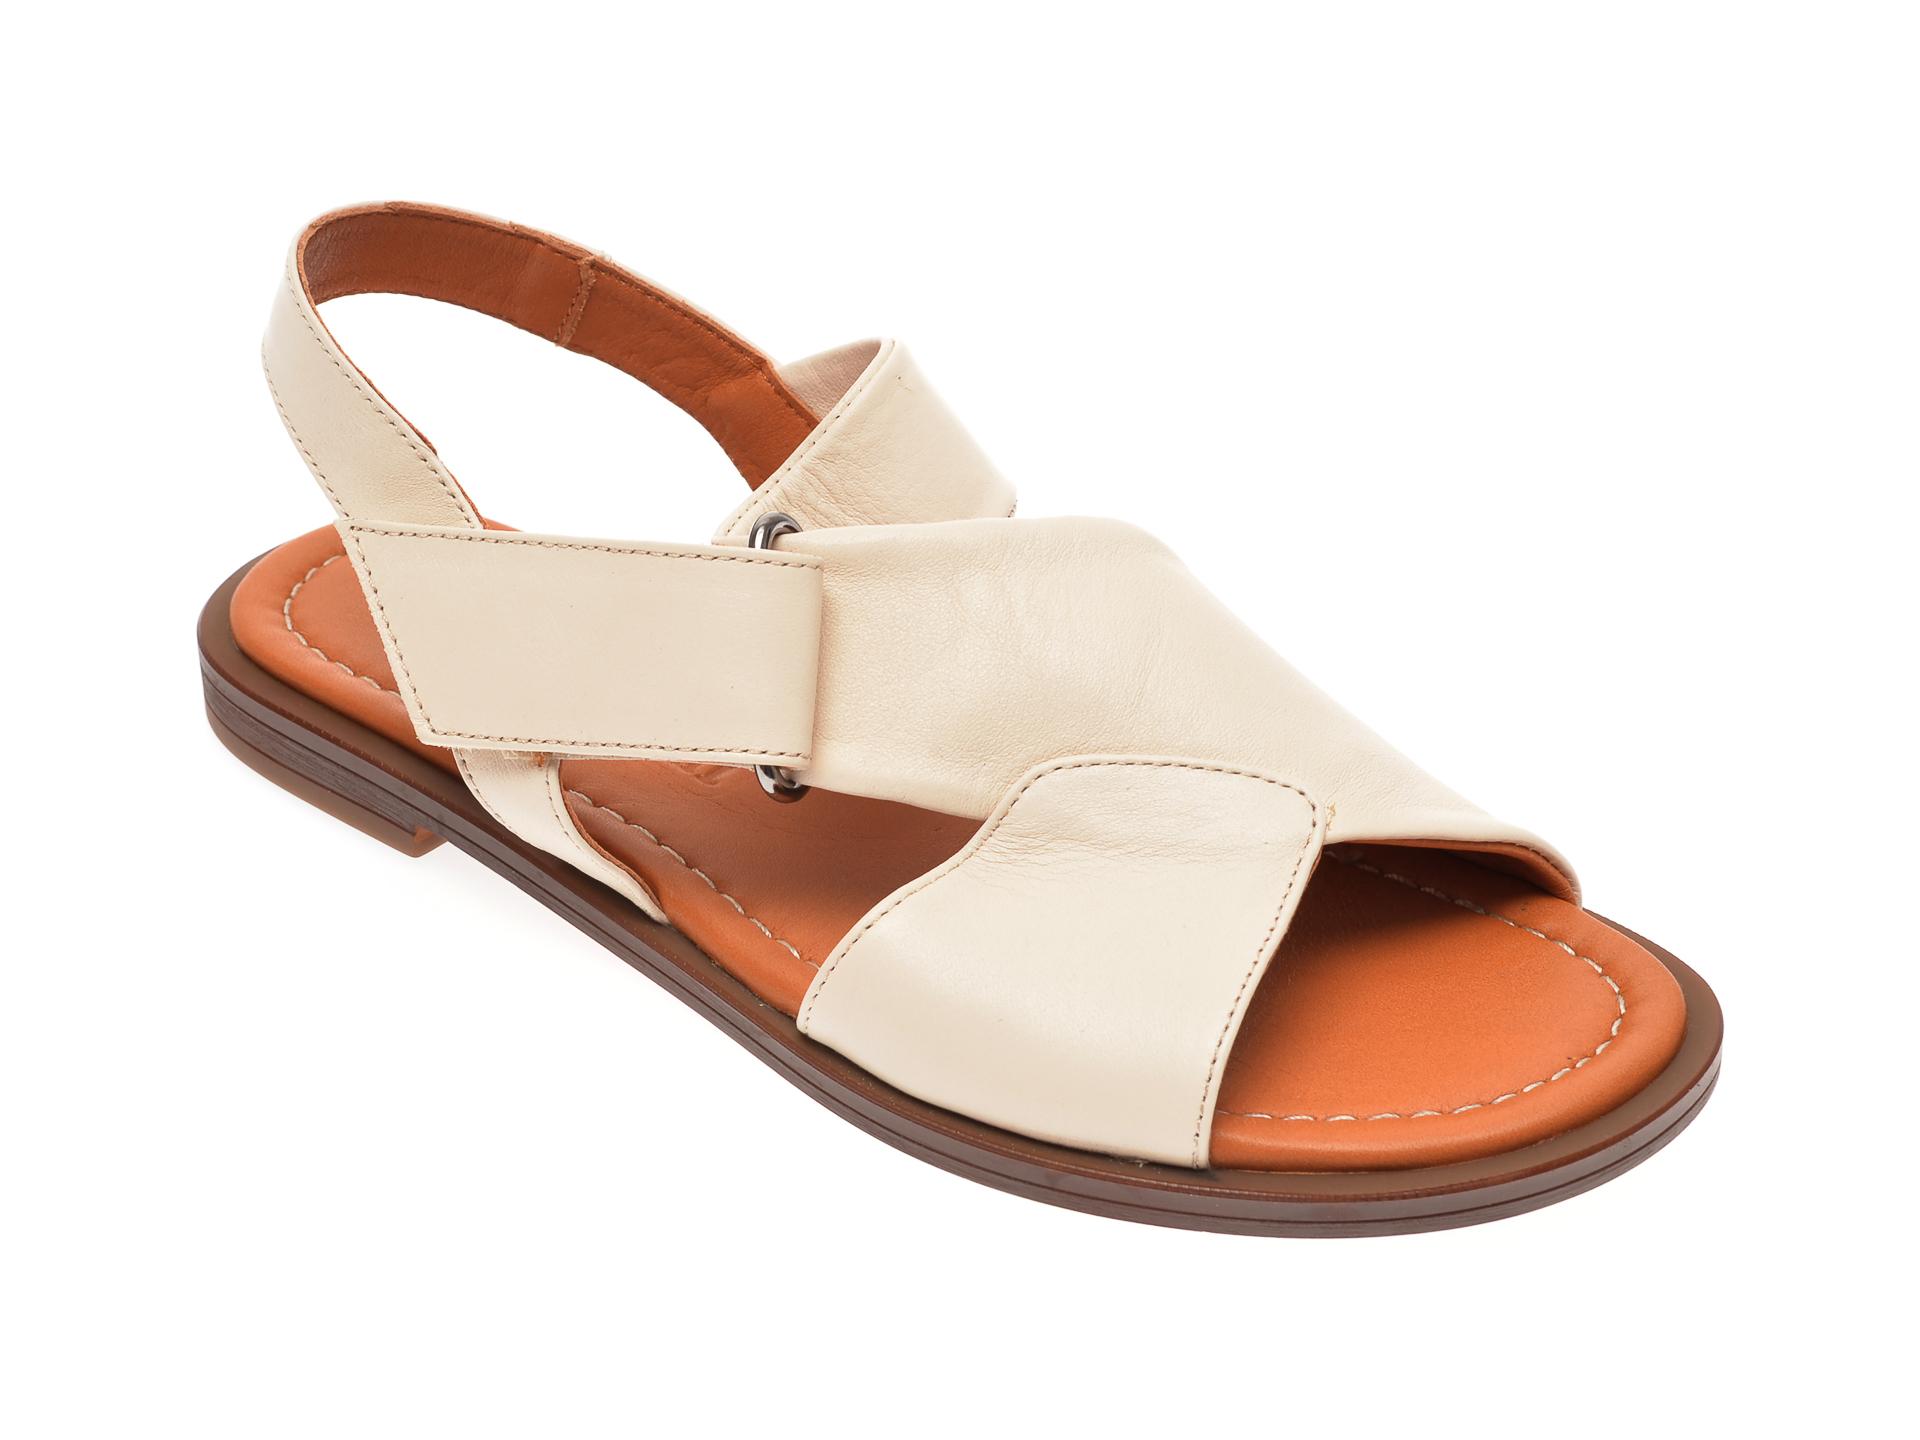 Sandale FLAVIA PASSINI bej, 0021673, din piele naturala